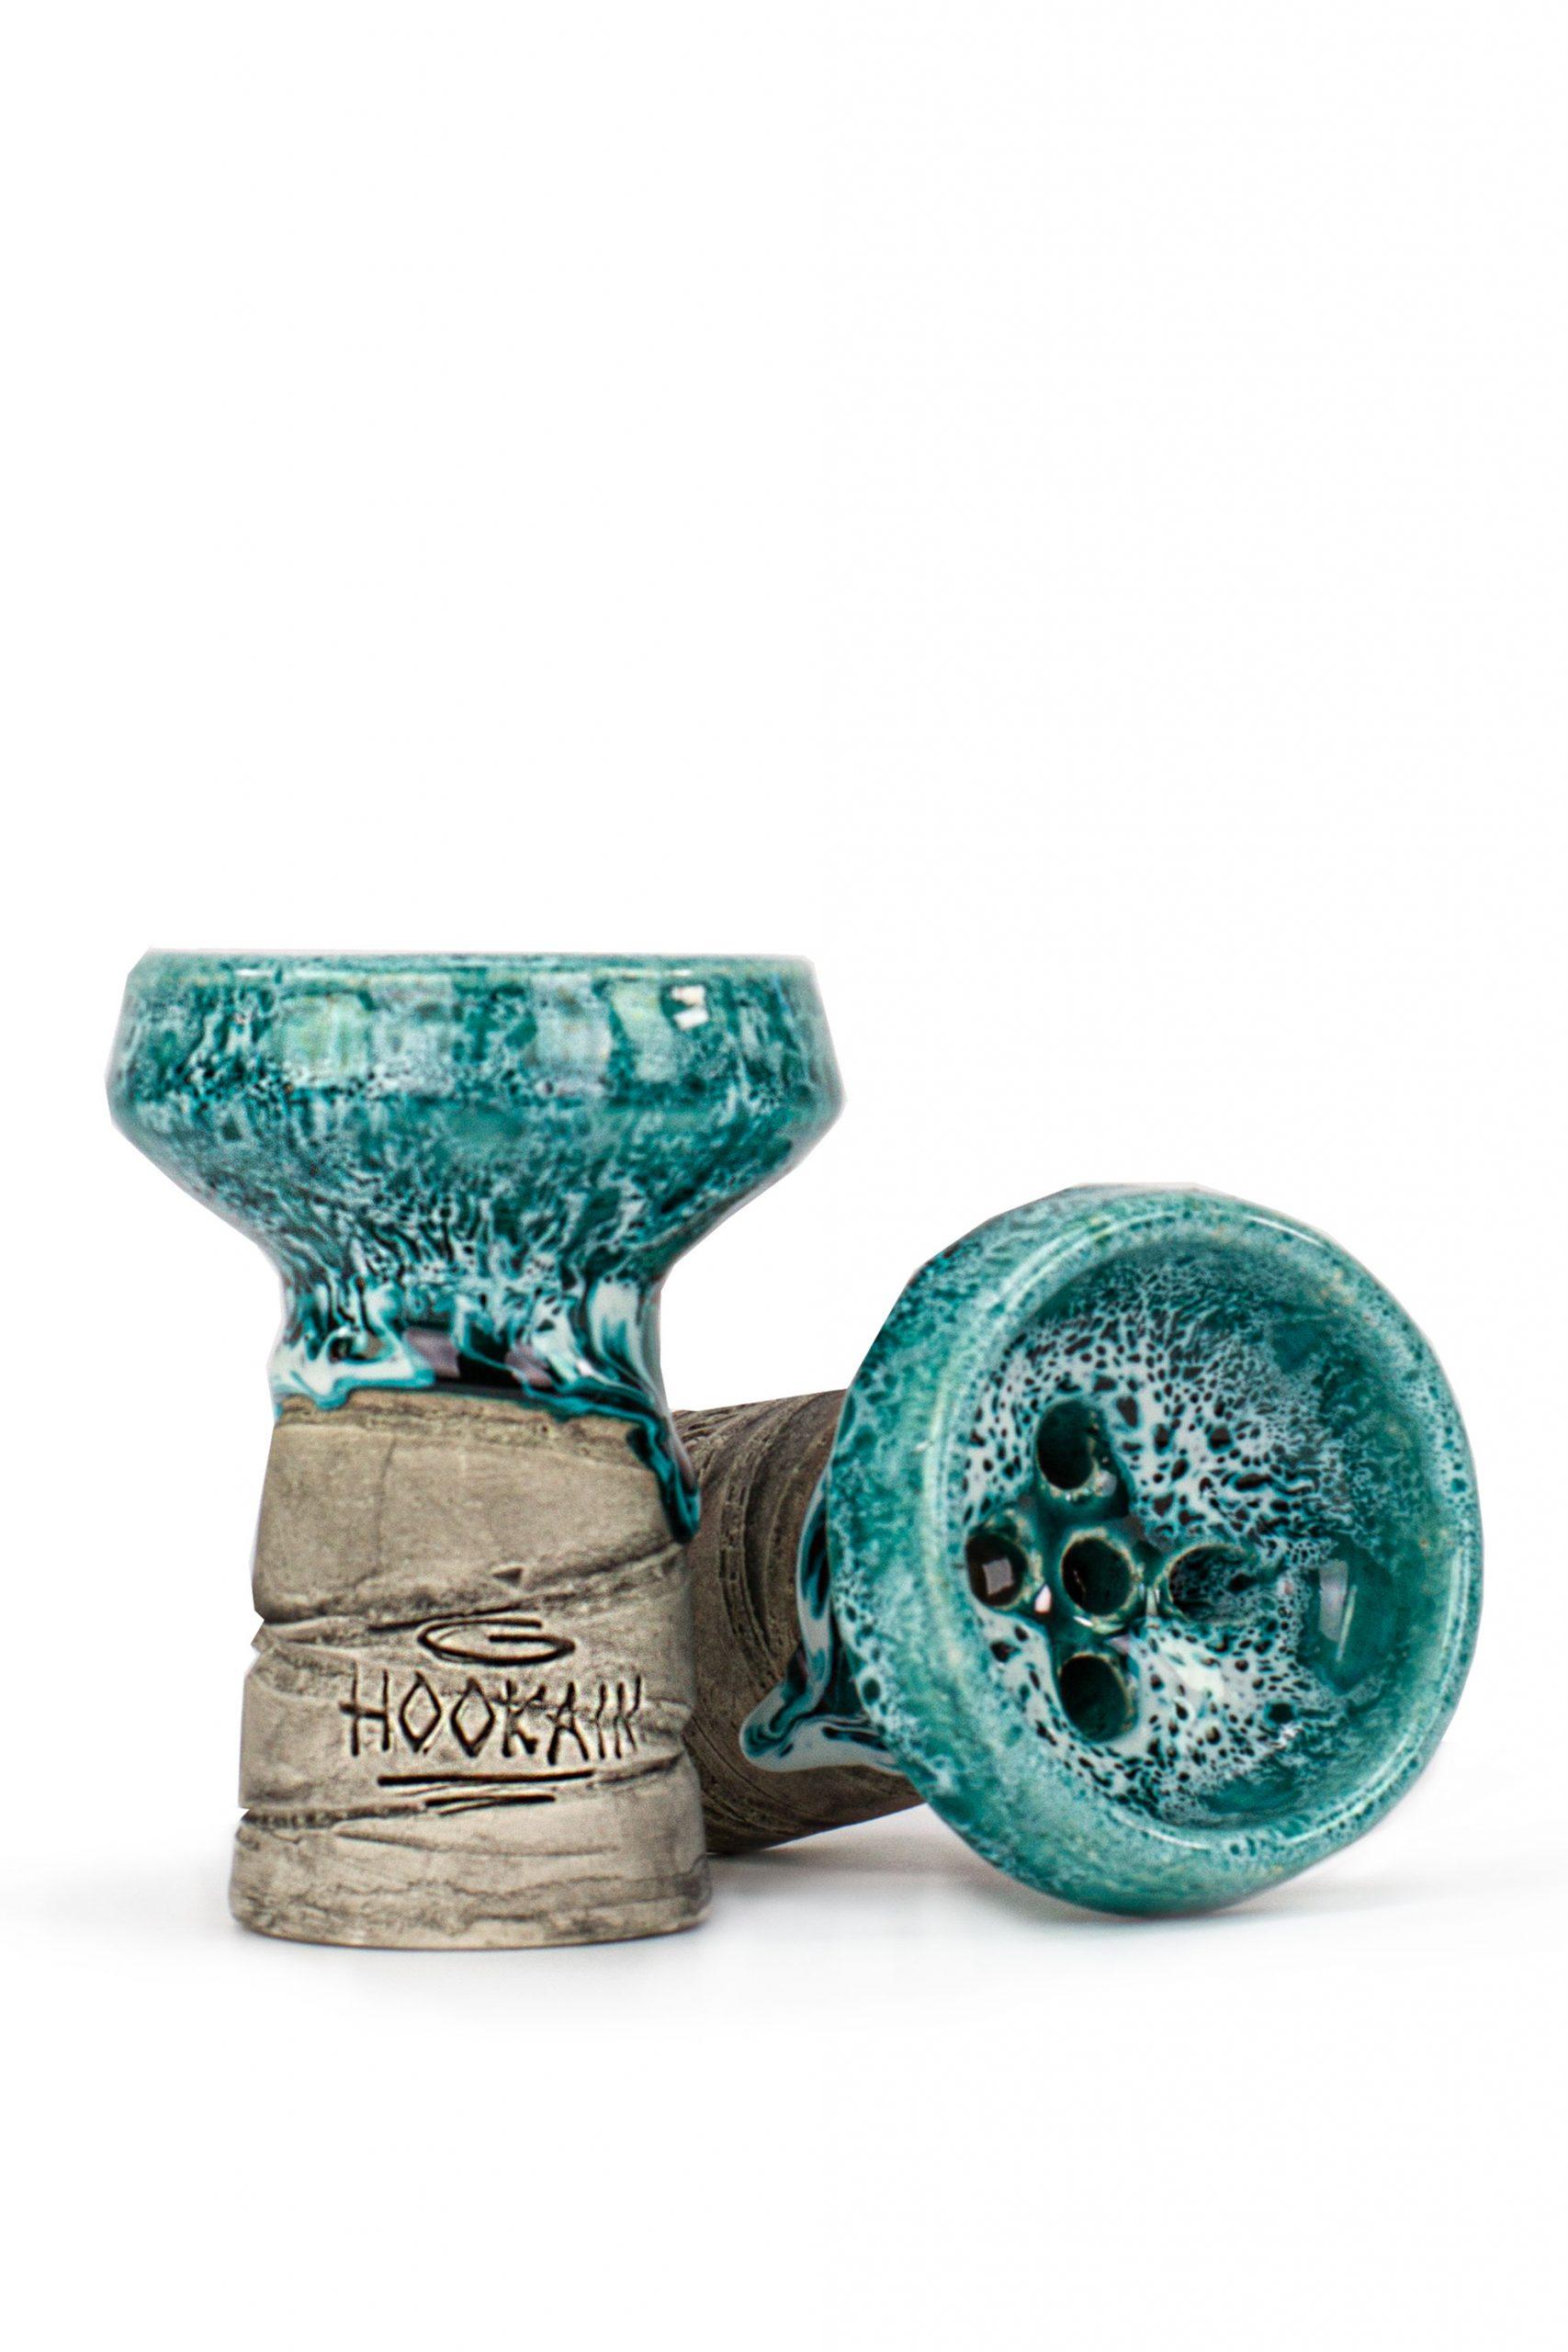 HOOKAiN Drip Bowl